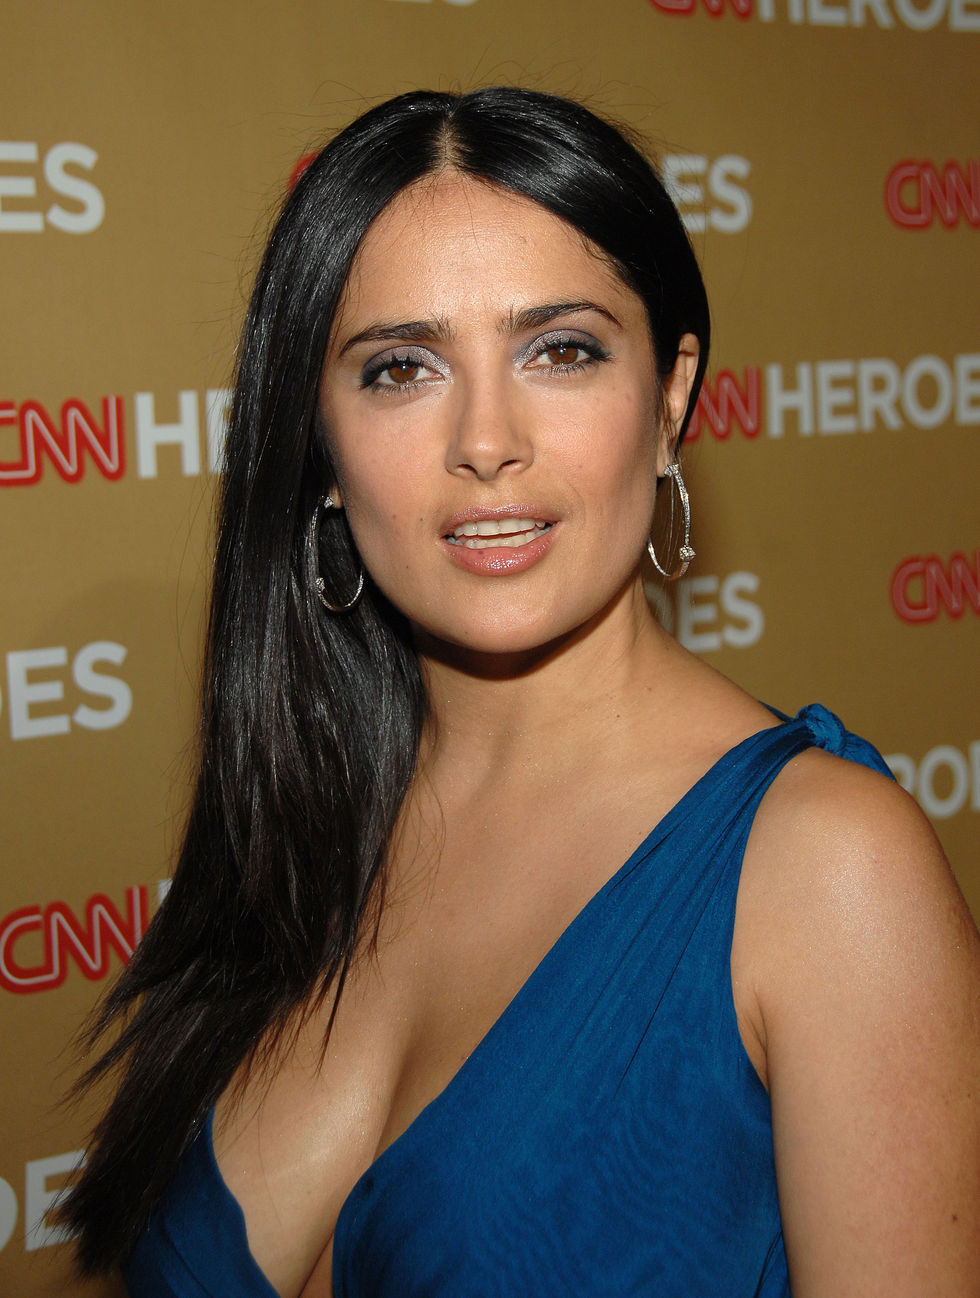 Mexican Actress Salma Hayek Hot In Blue Dress